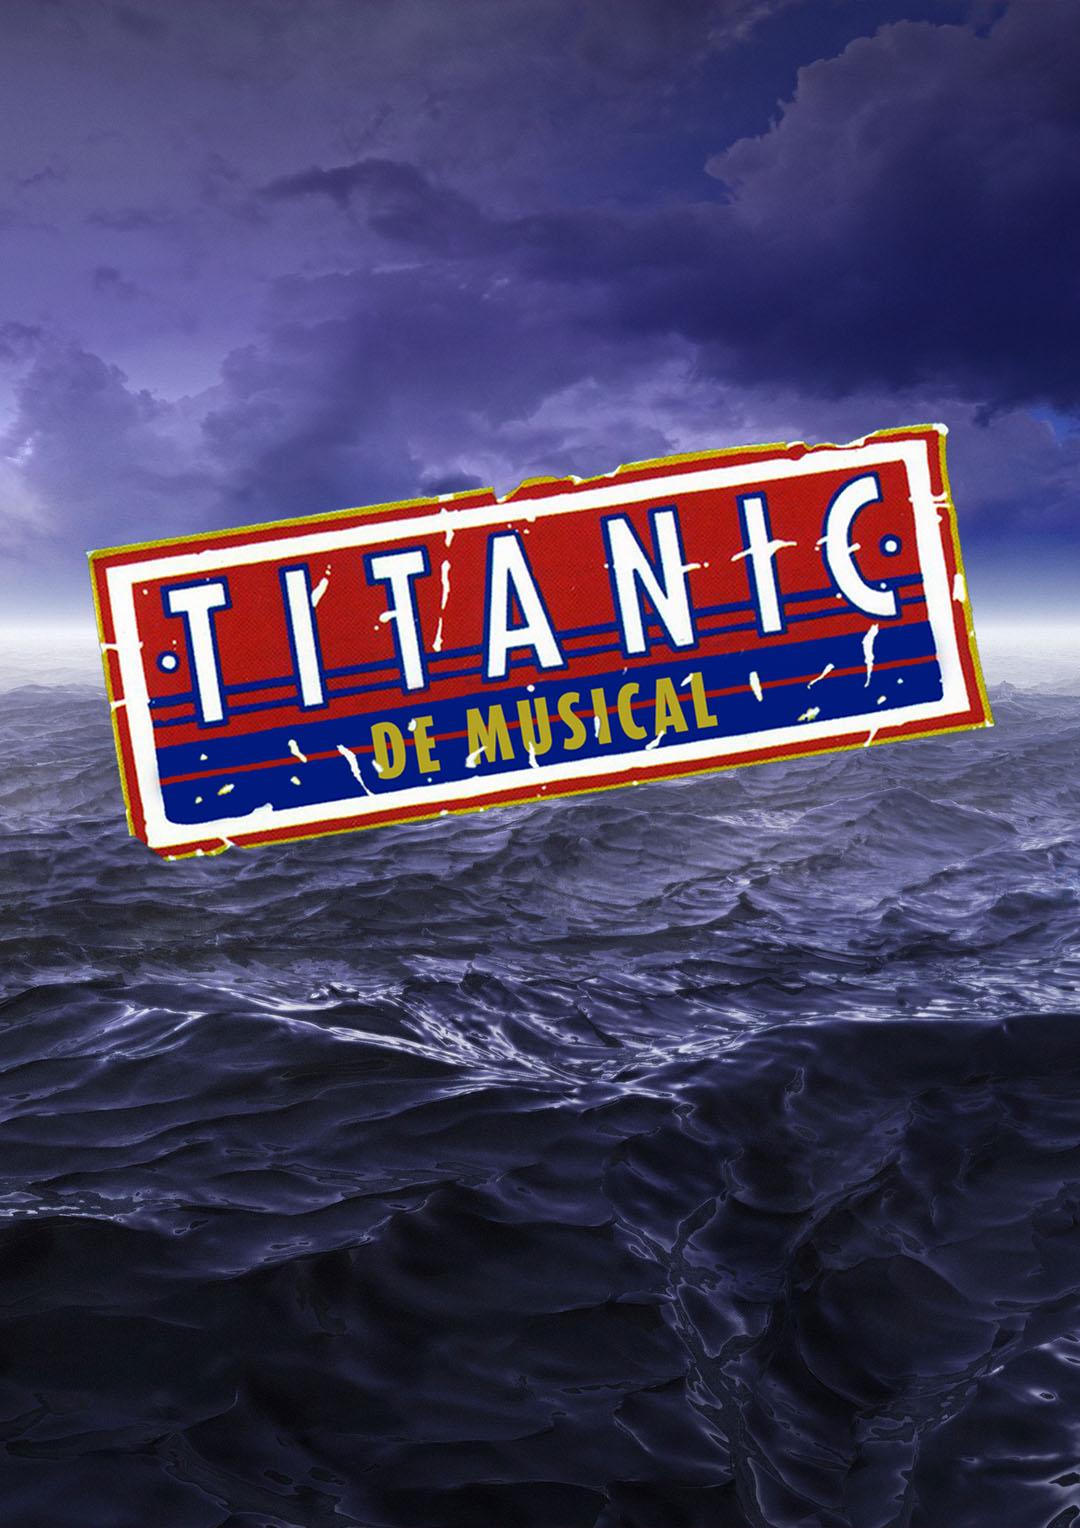 Titanic de Musical artwork